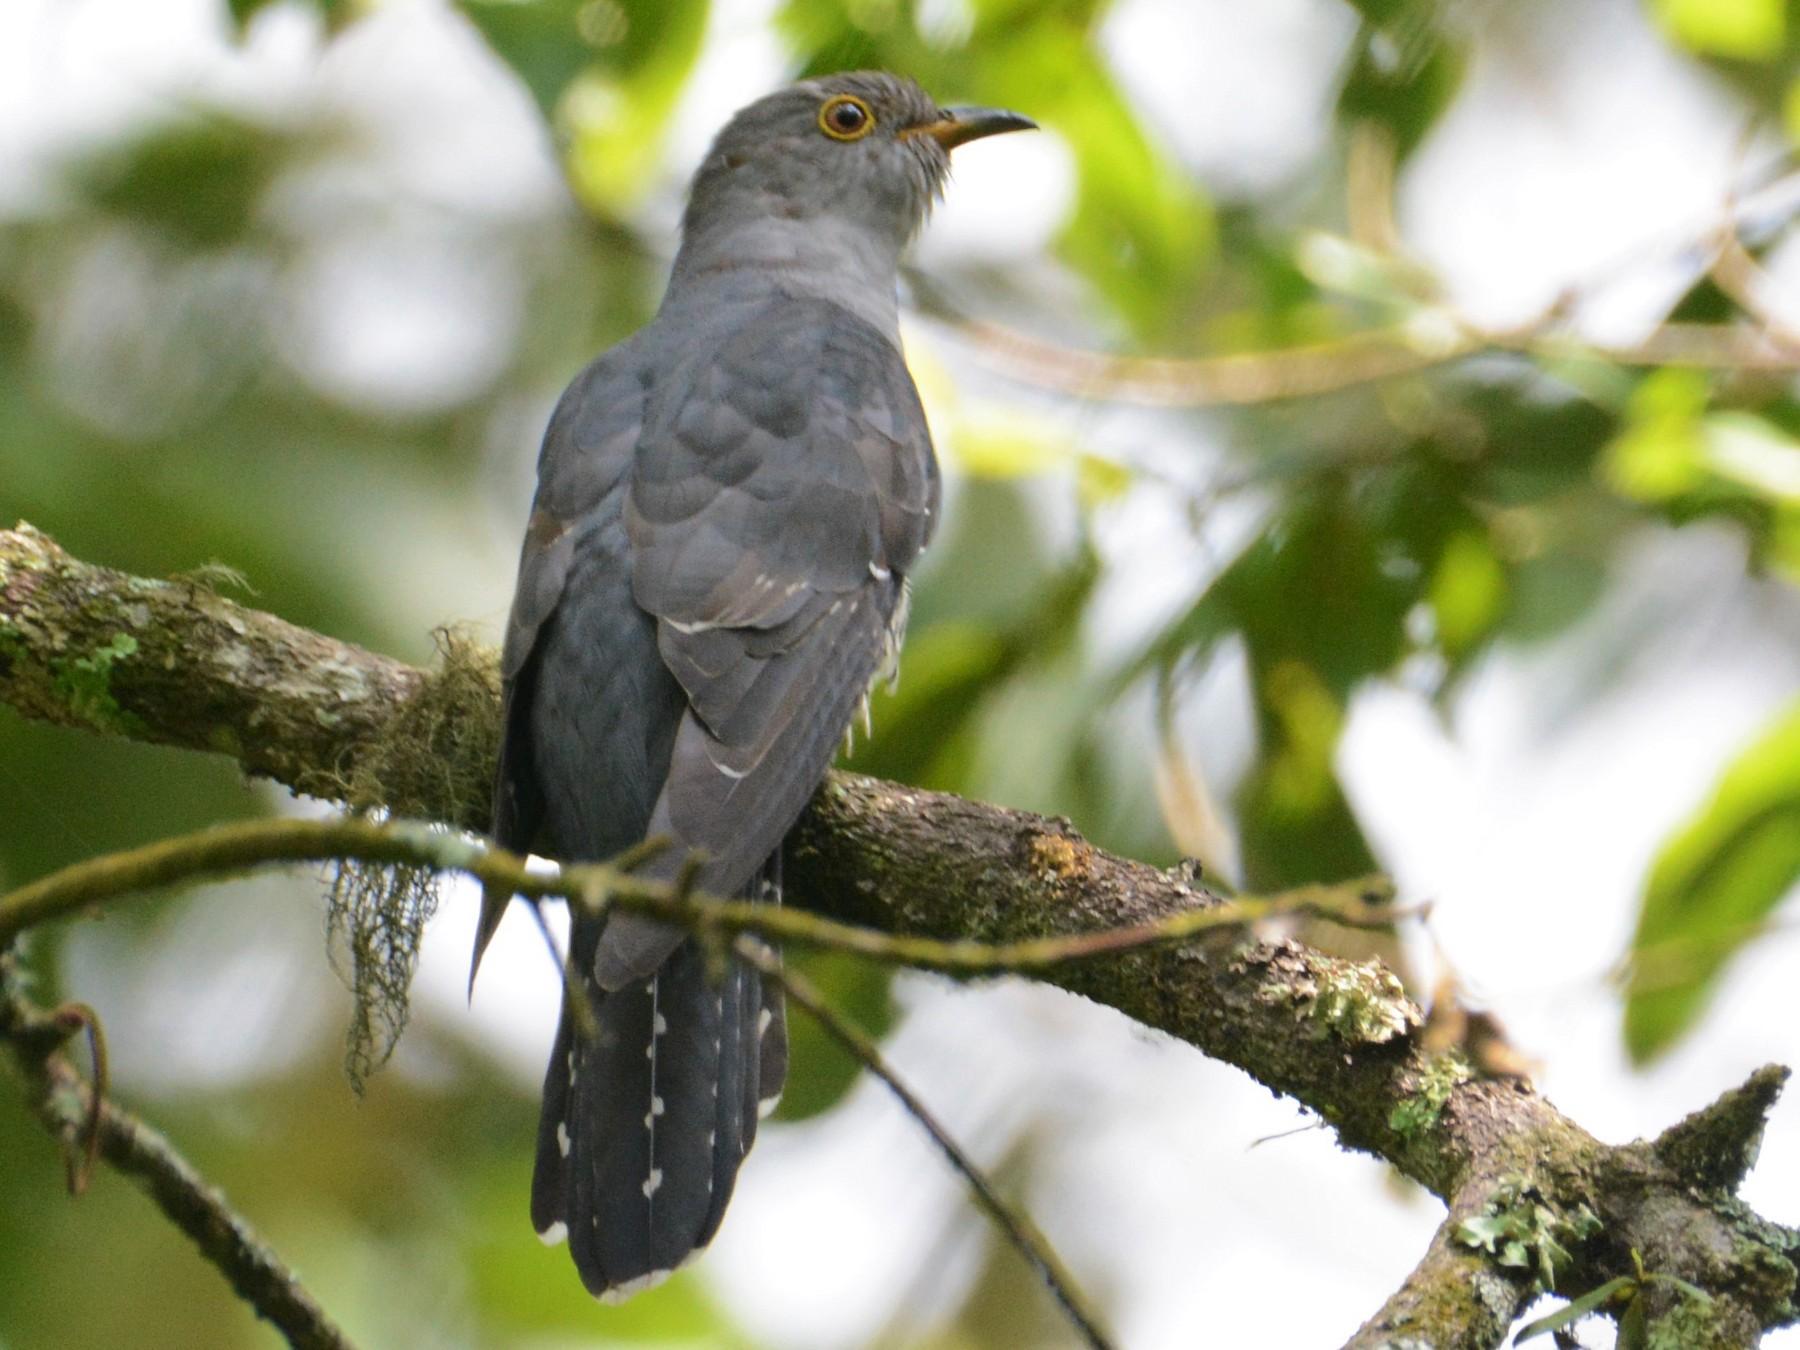 Himalayan Cuckoo - Ari Noviyono